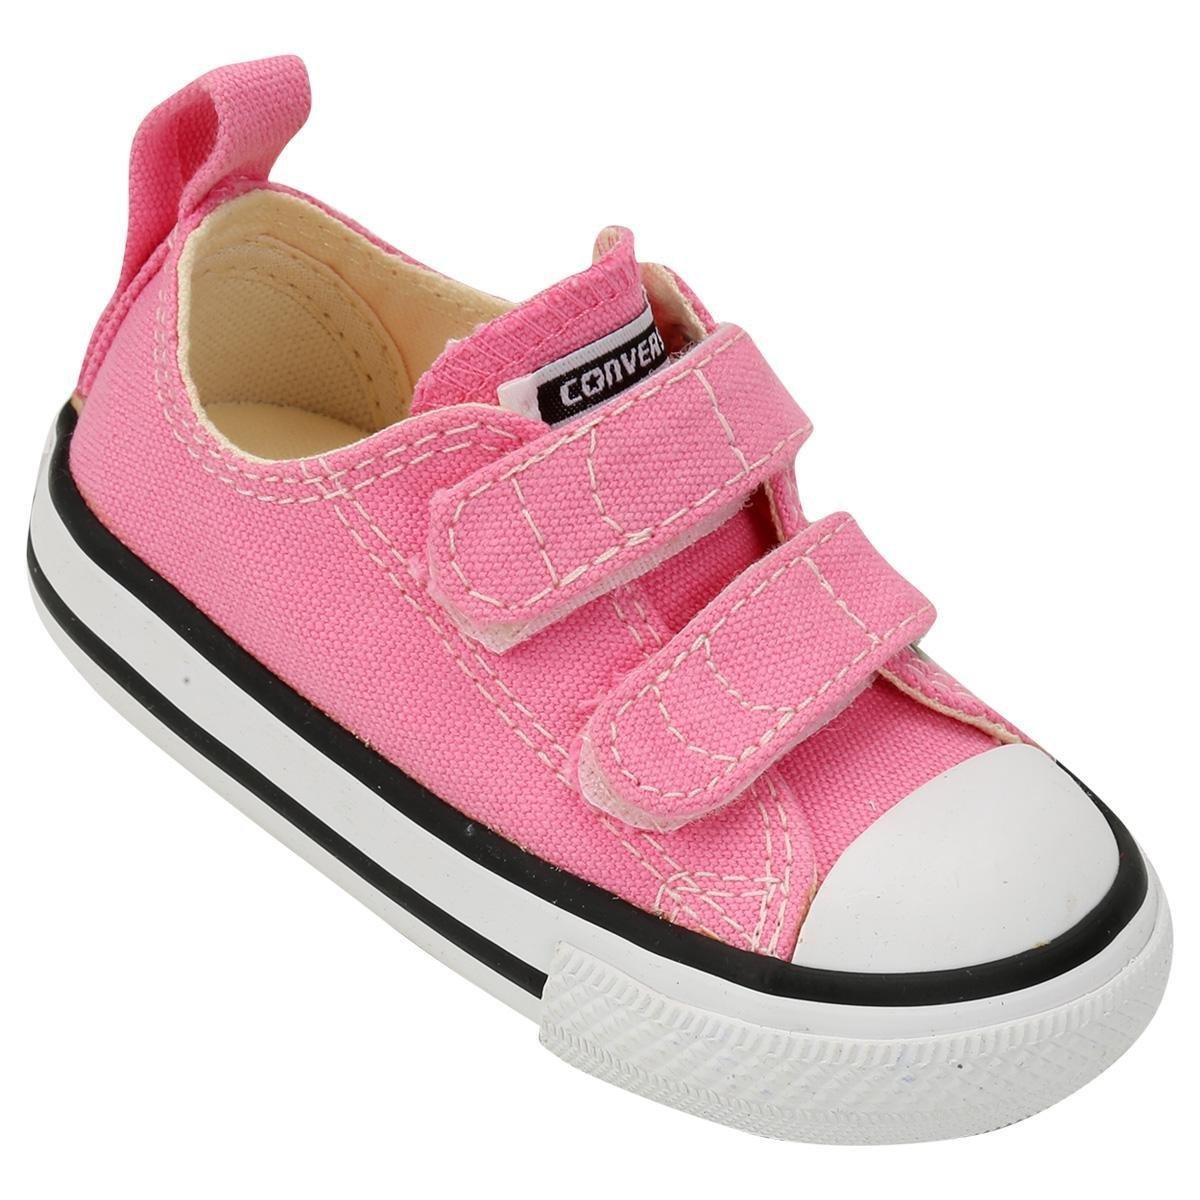 71483bf4833 Tênis Infantil Converse Chuck Taylor All Star 2 Velcros Baby ...